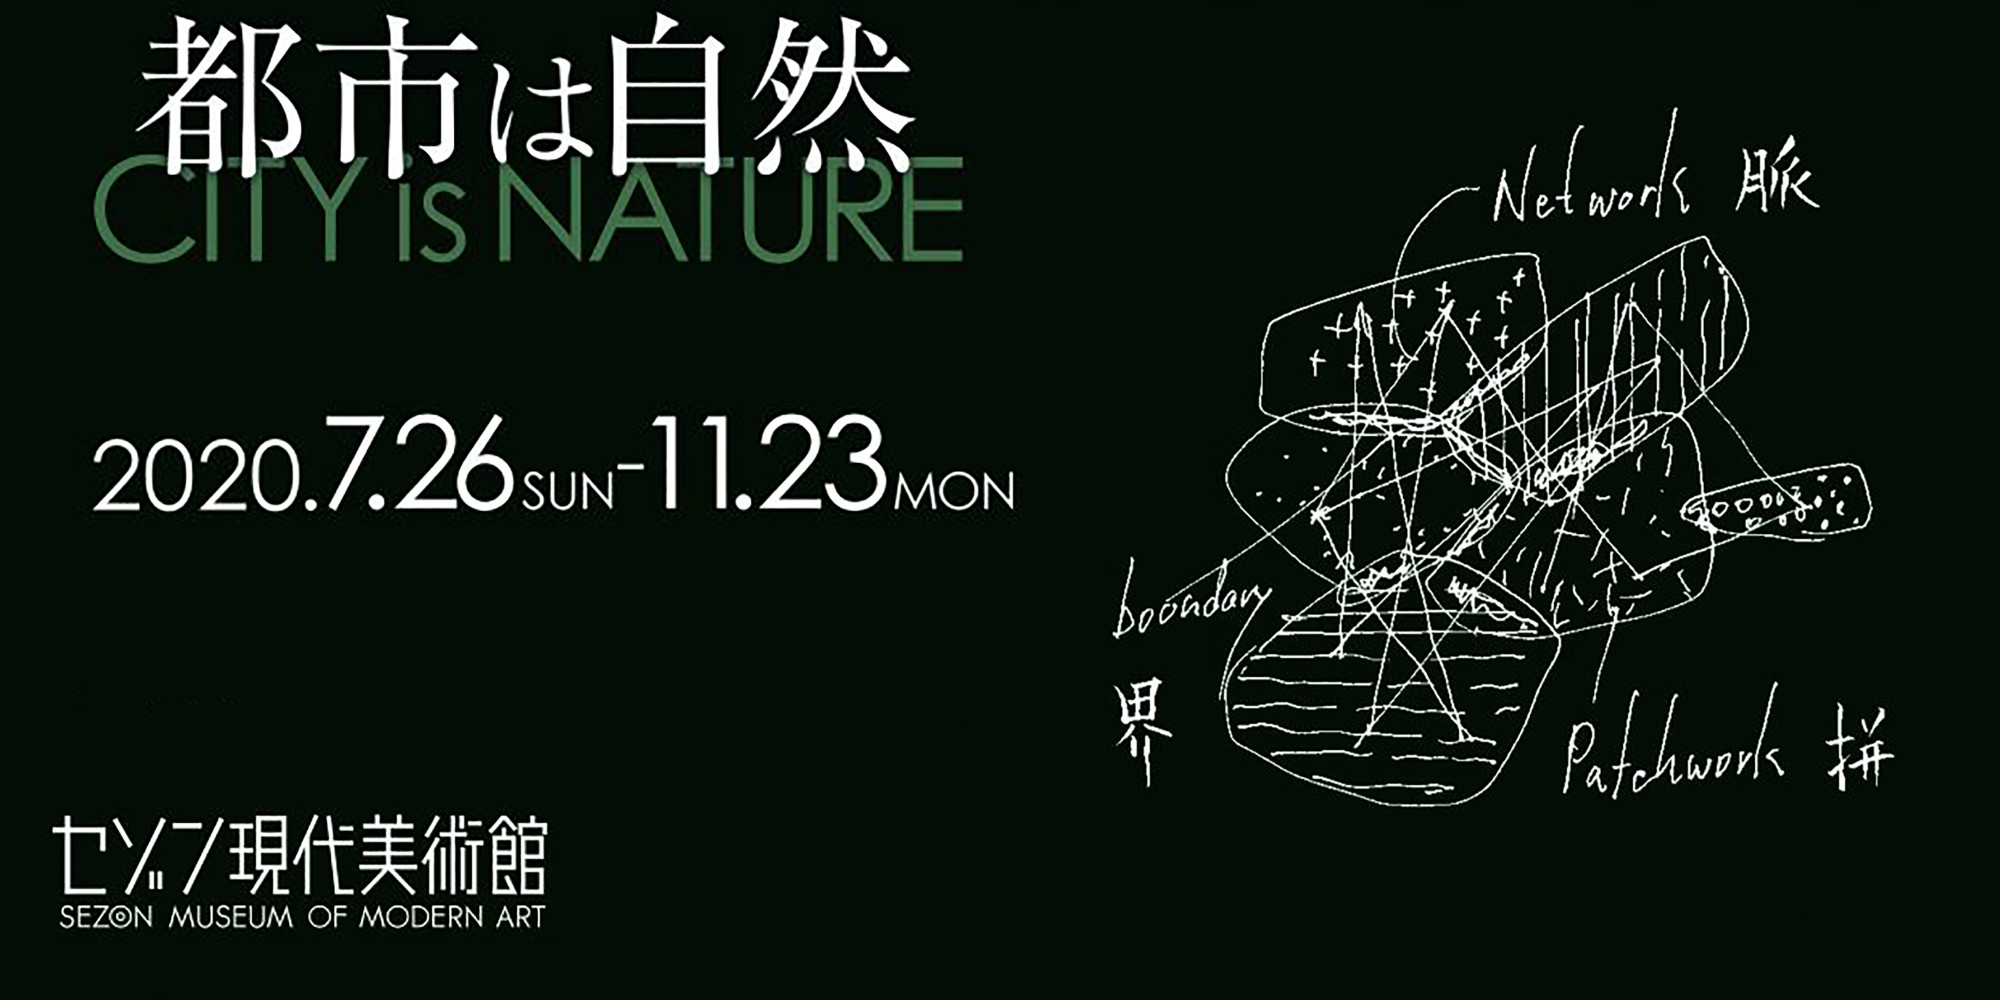 磯村暖出展「都市は自然」セゾン現代美術館